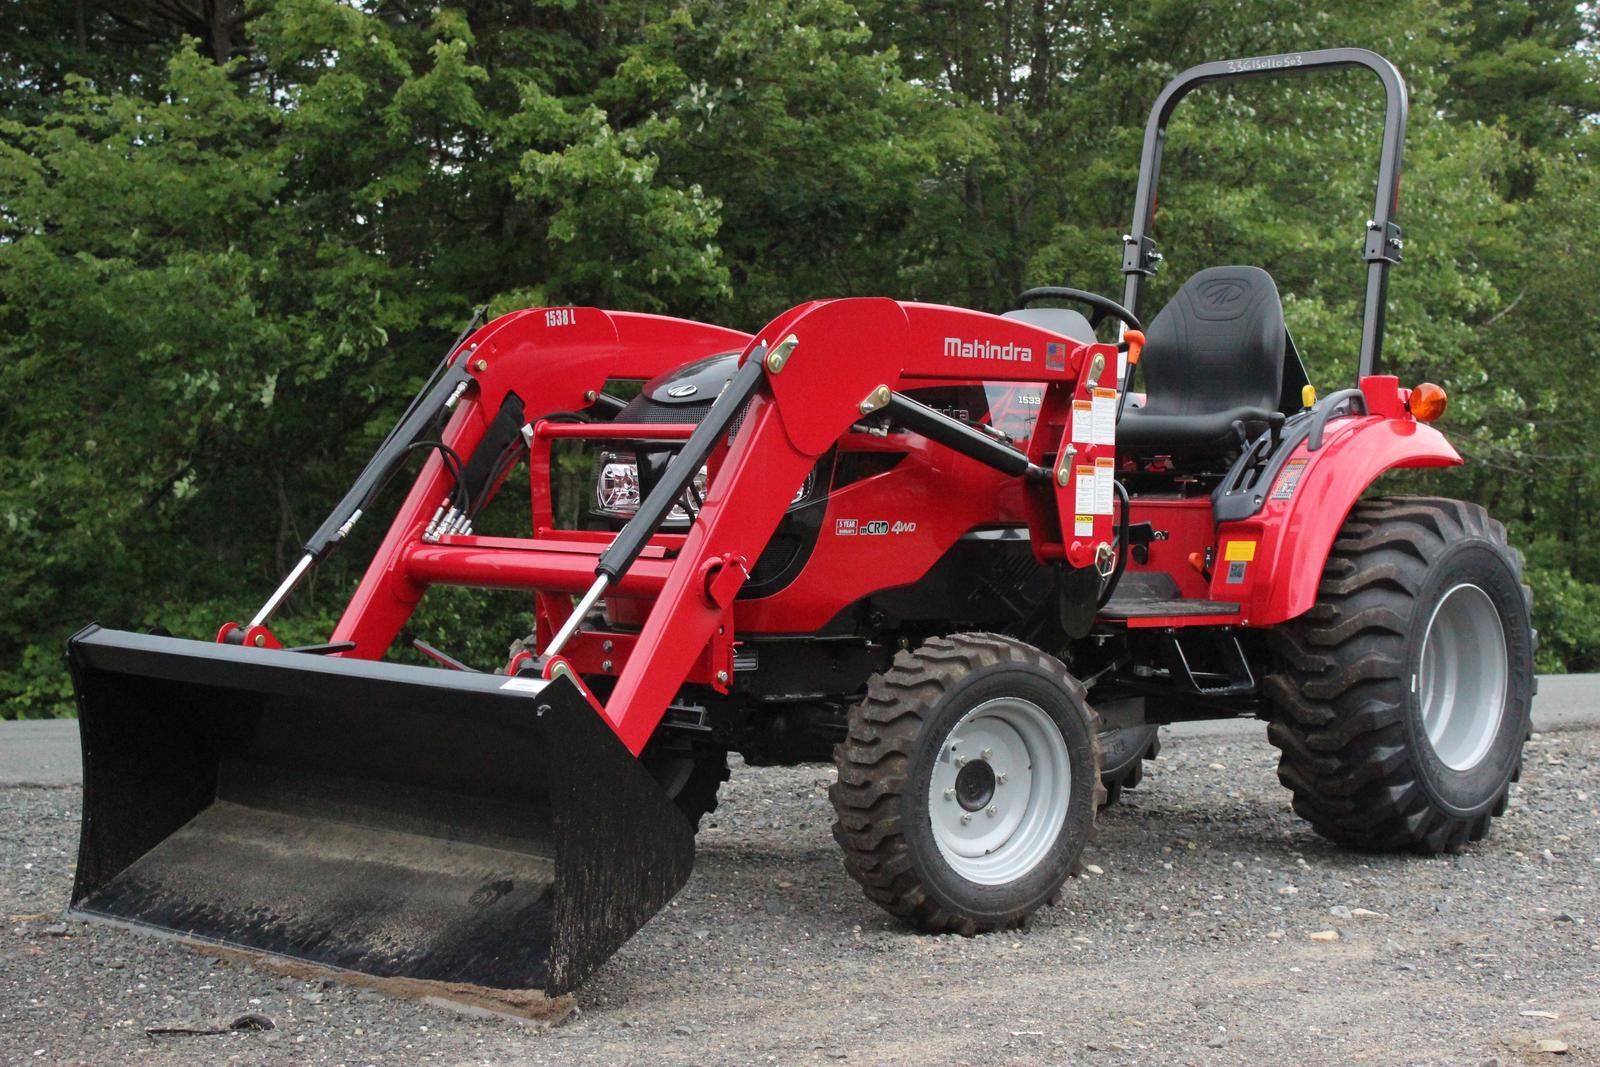 Mahindra 1533 Shuttle Tractor & Loader - Mahindra · Mahindra 1533 Shuttle  Tractor ...